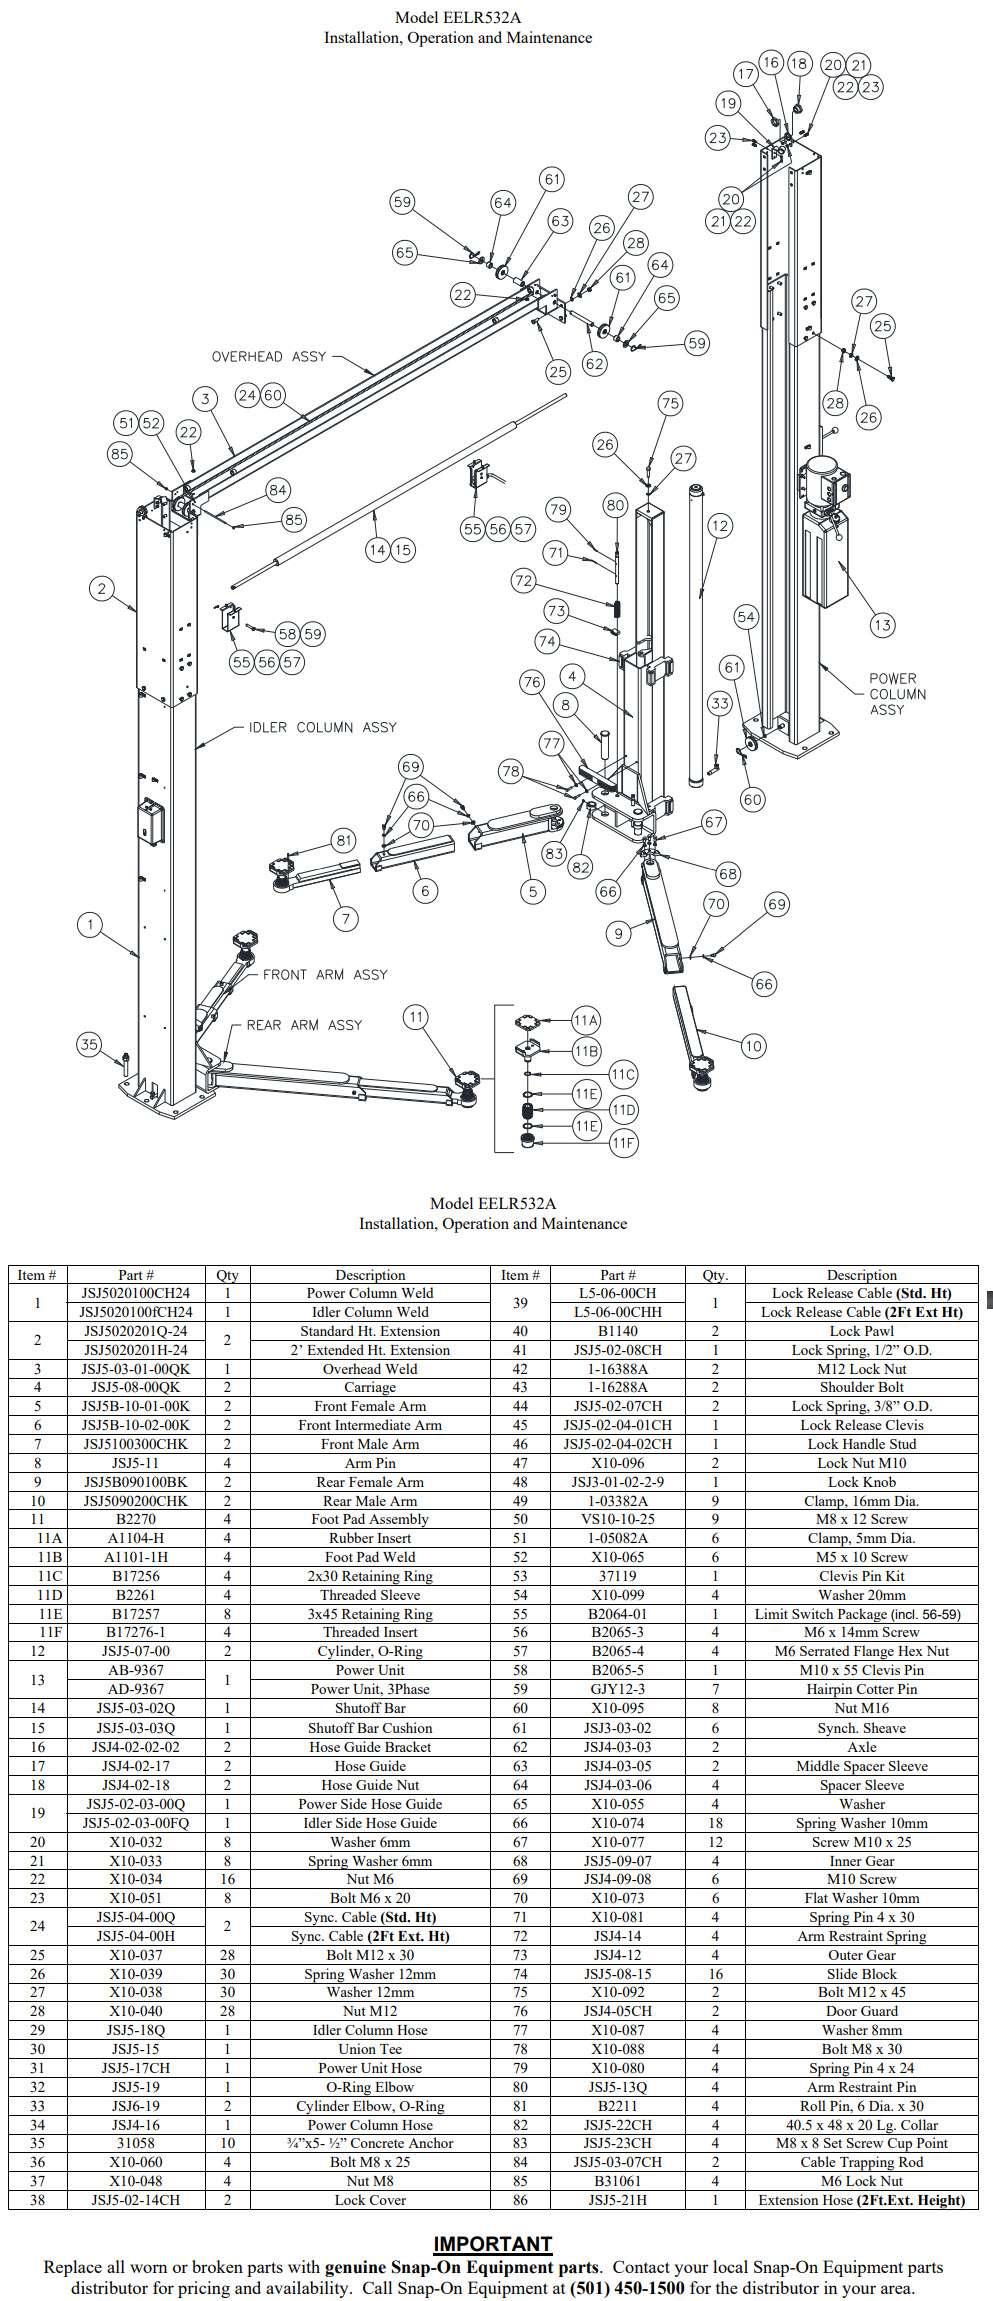 EELR532A 2 post part breakdown